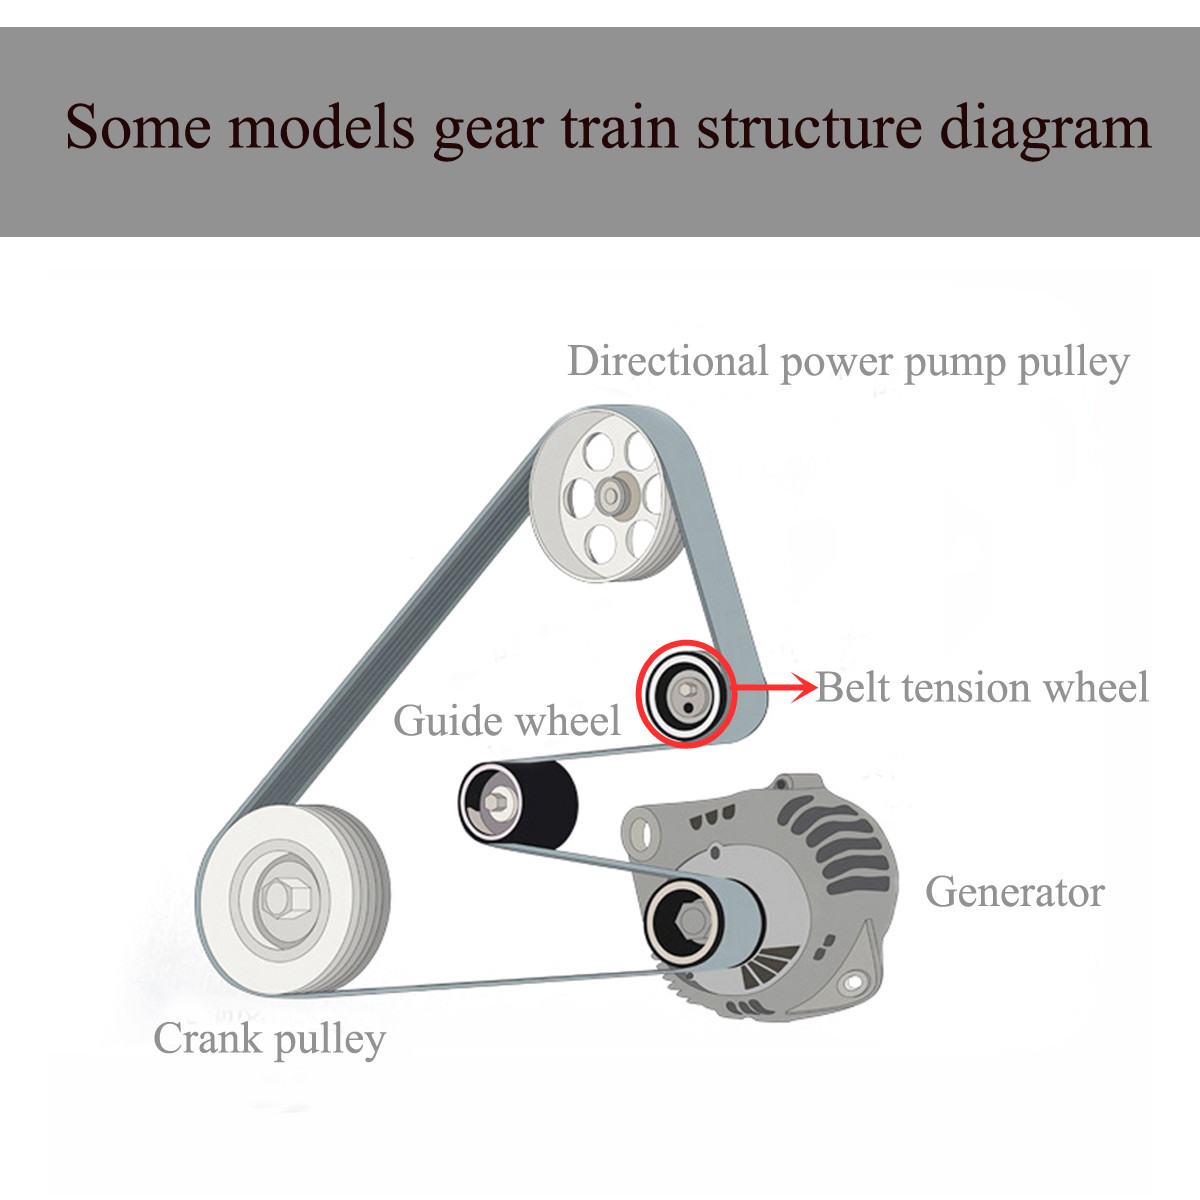 E46 320d Serpentine Belt Diagram Trusted Wiring Diagrams Fan Pulley Product U2022 E38